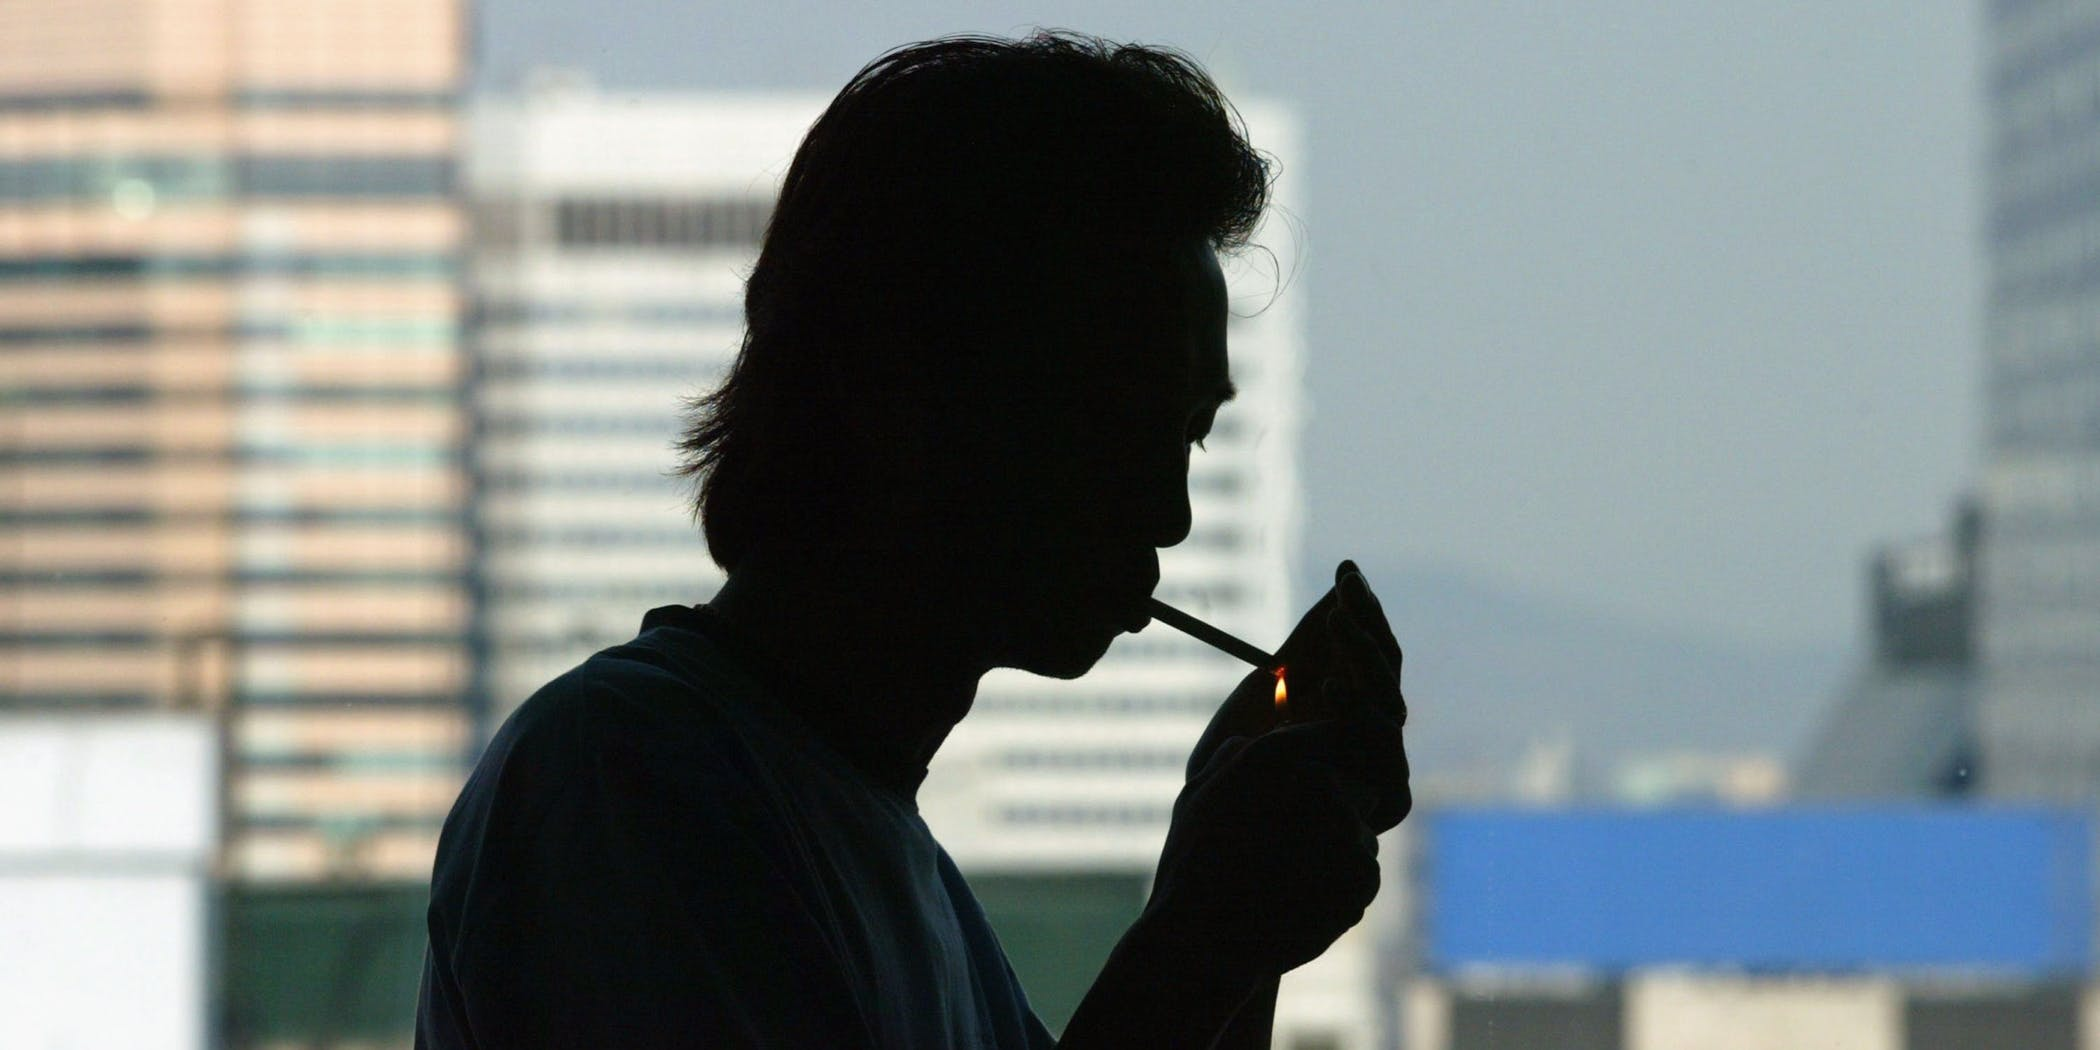 South Korean Man lights up a marijuana joint